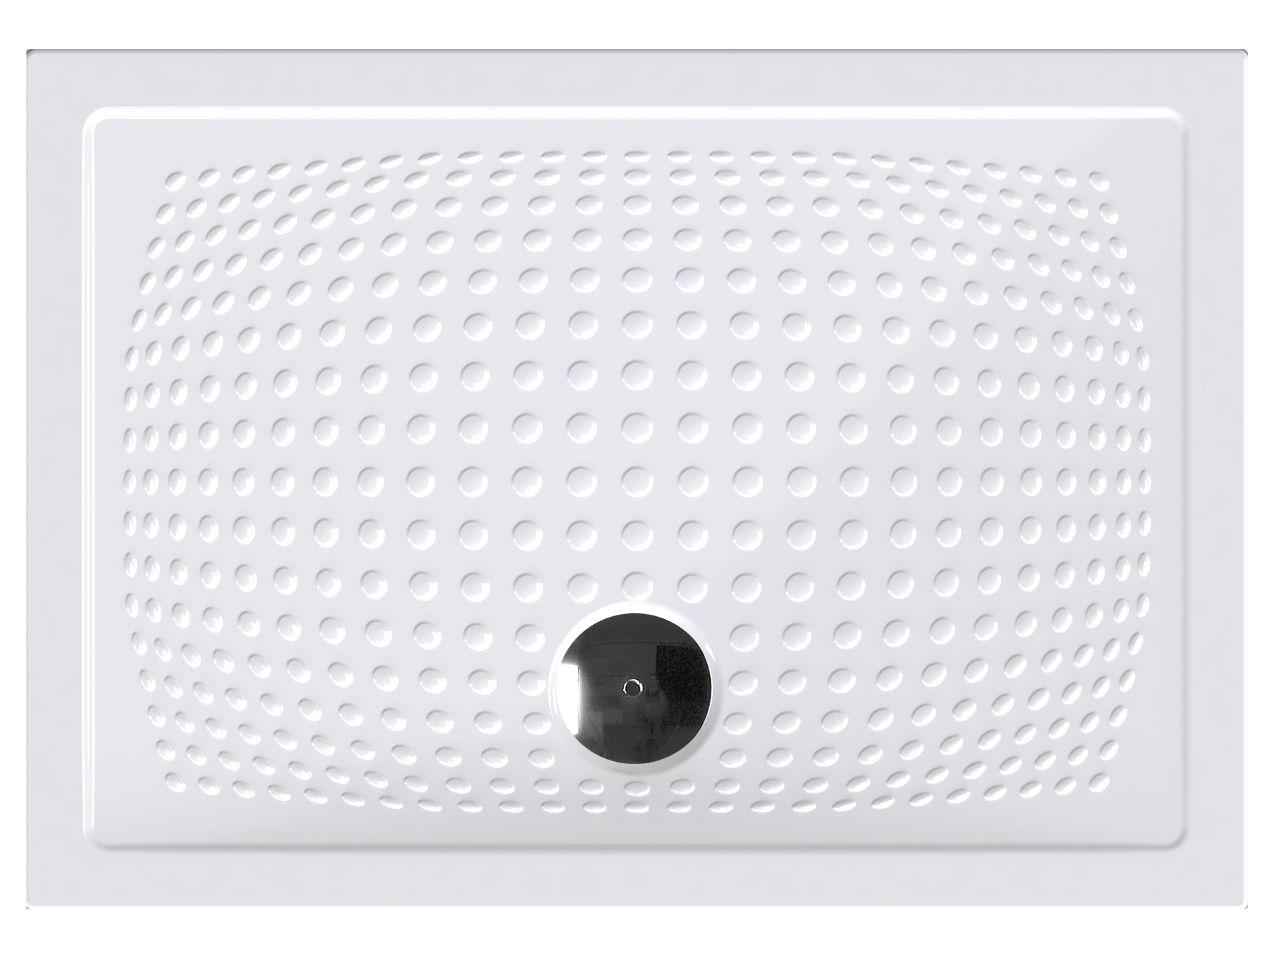 Piatto doccia energy 70x100xh3 5 bianco venduto da for Doccia iperceramica